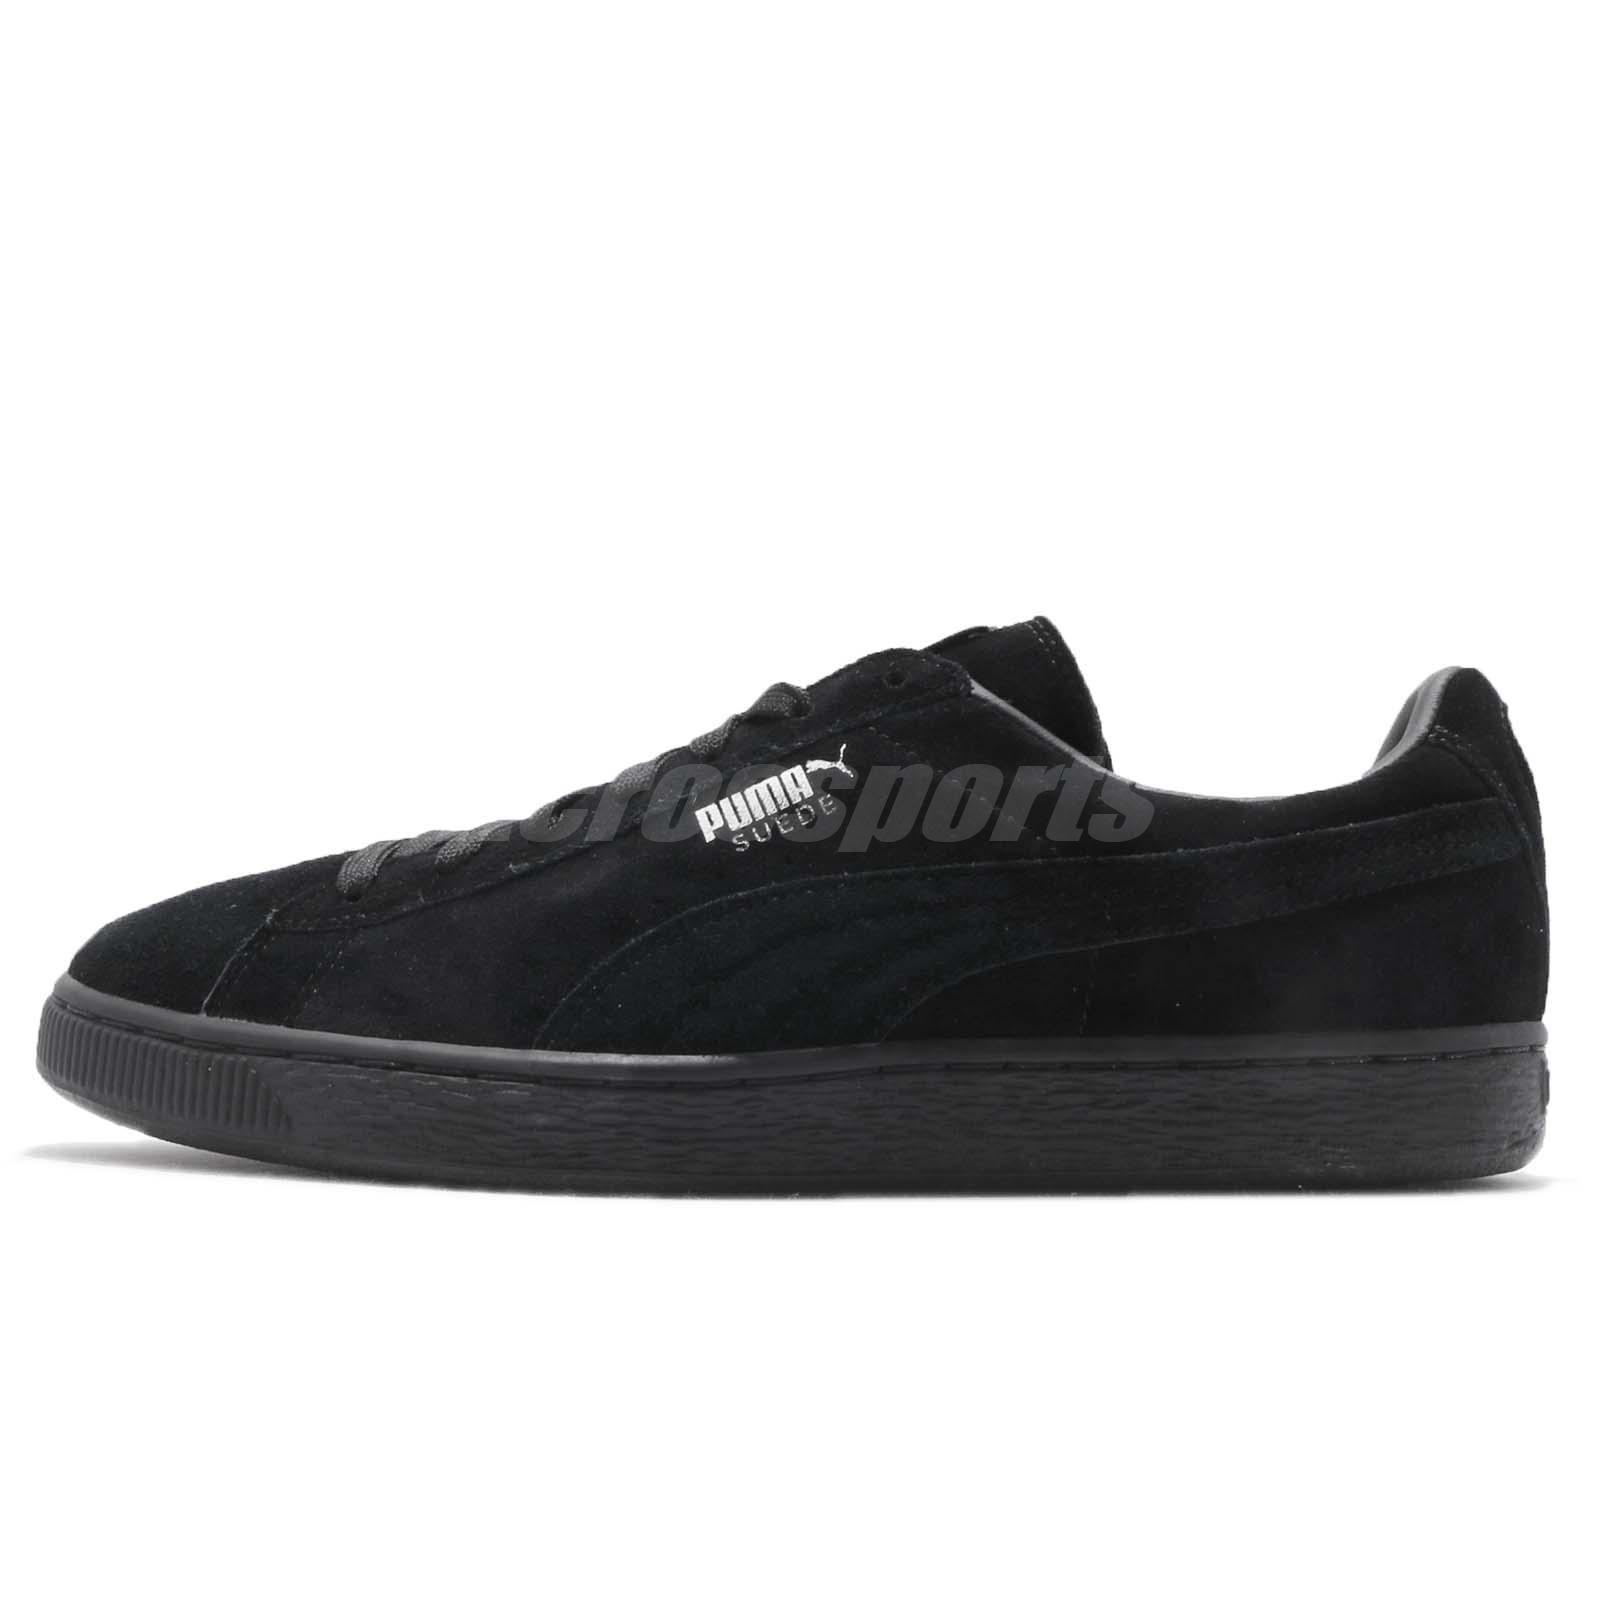 a1ec44b6f5cfd Puma Suede Classic Black Dark Shadow Men Casual Shoes Sneakers 352634-77